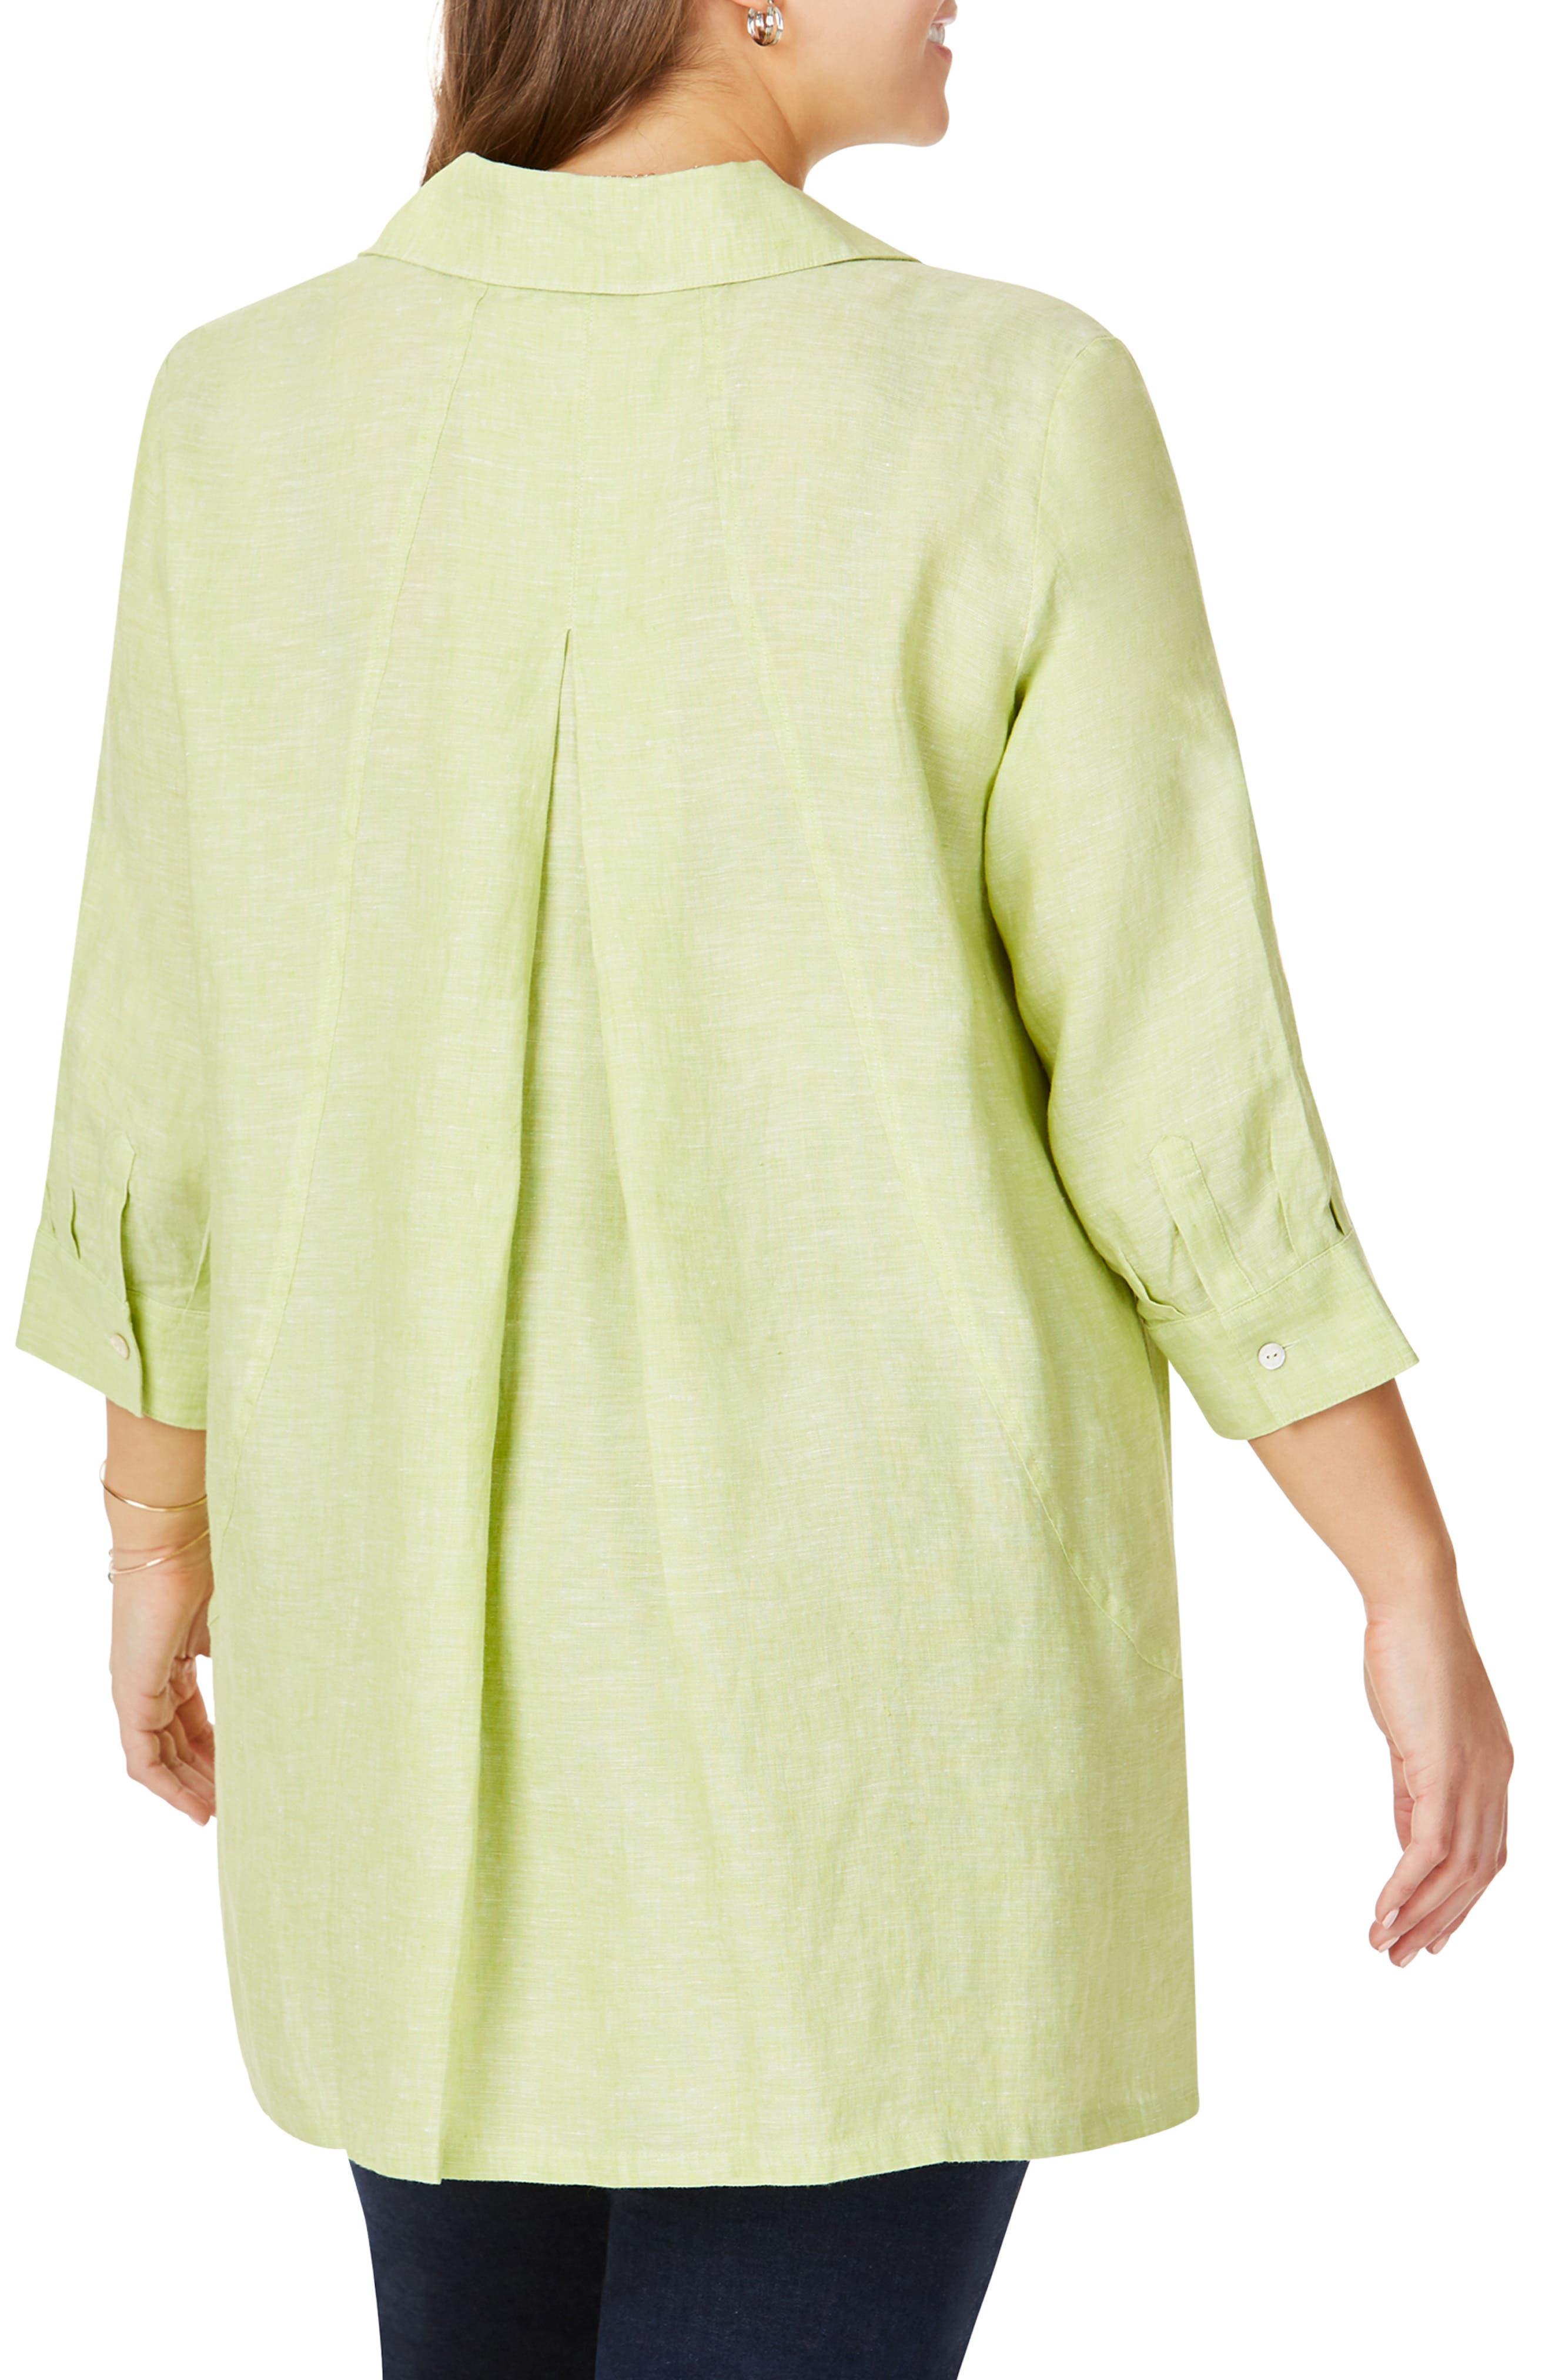 FOXCROFT, Chambray Linen Tunic Shirt, Alternate thumbnail 2, color, MARGARITA